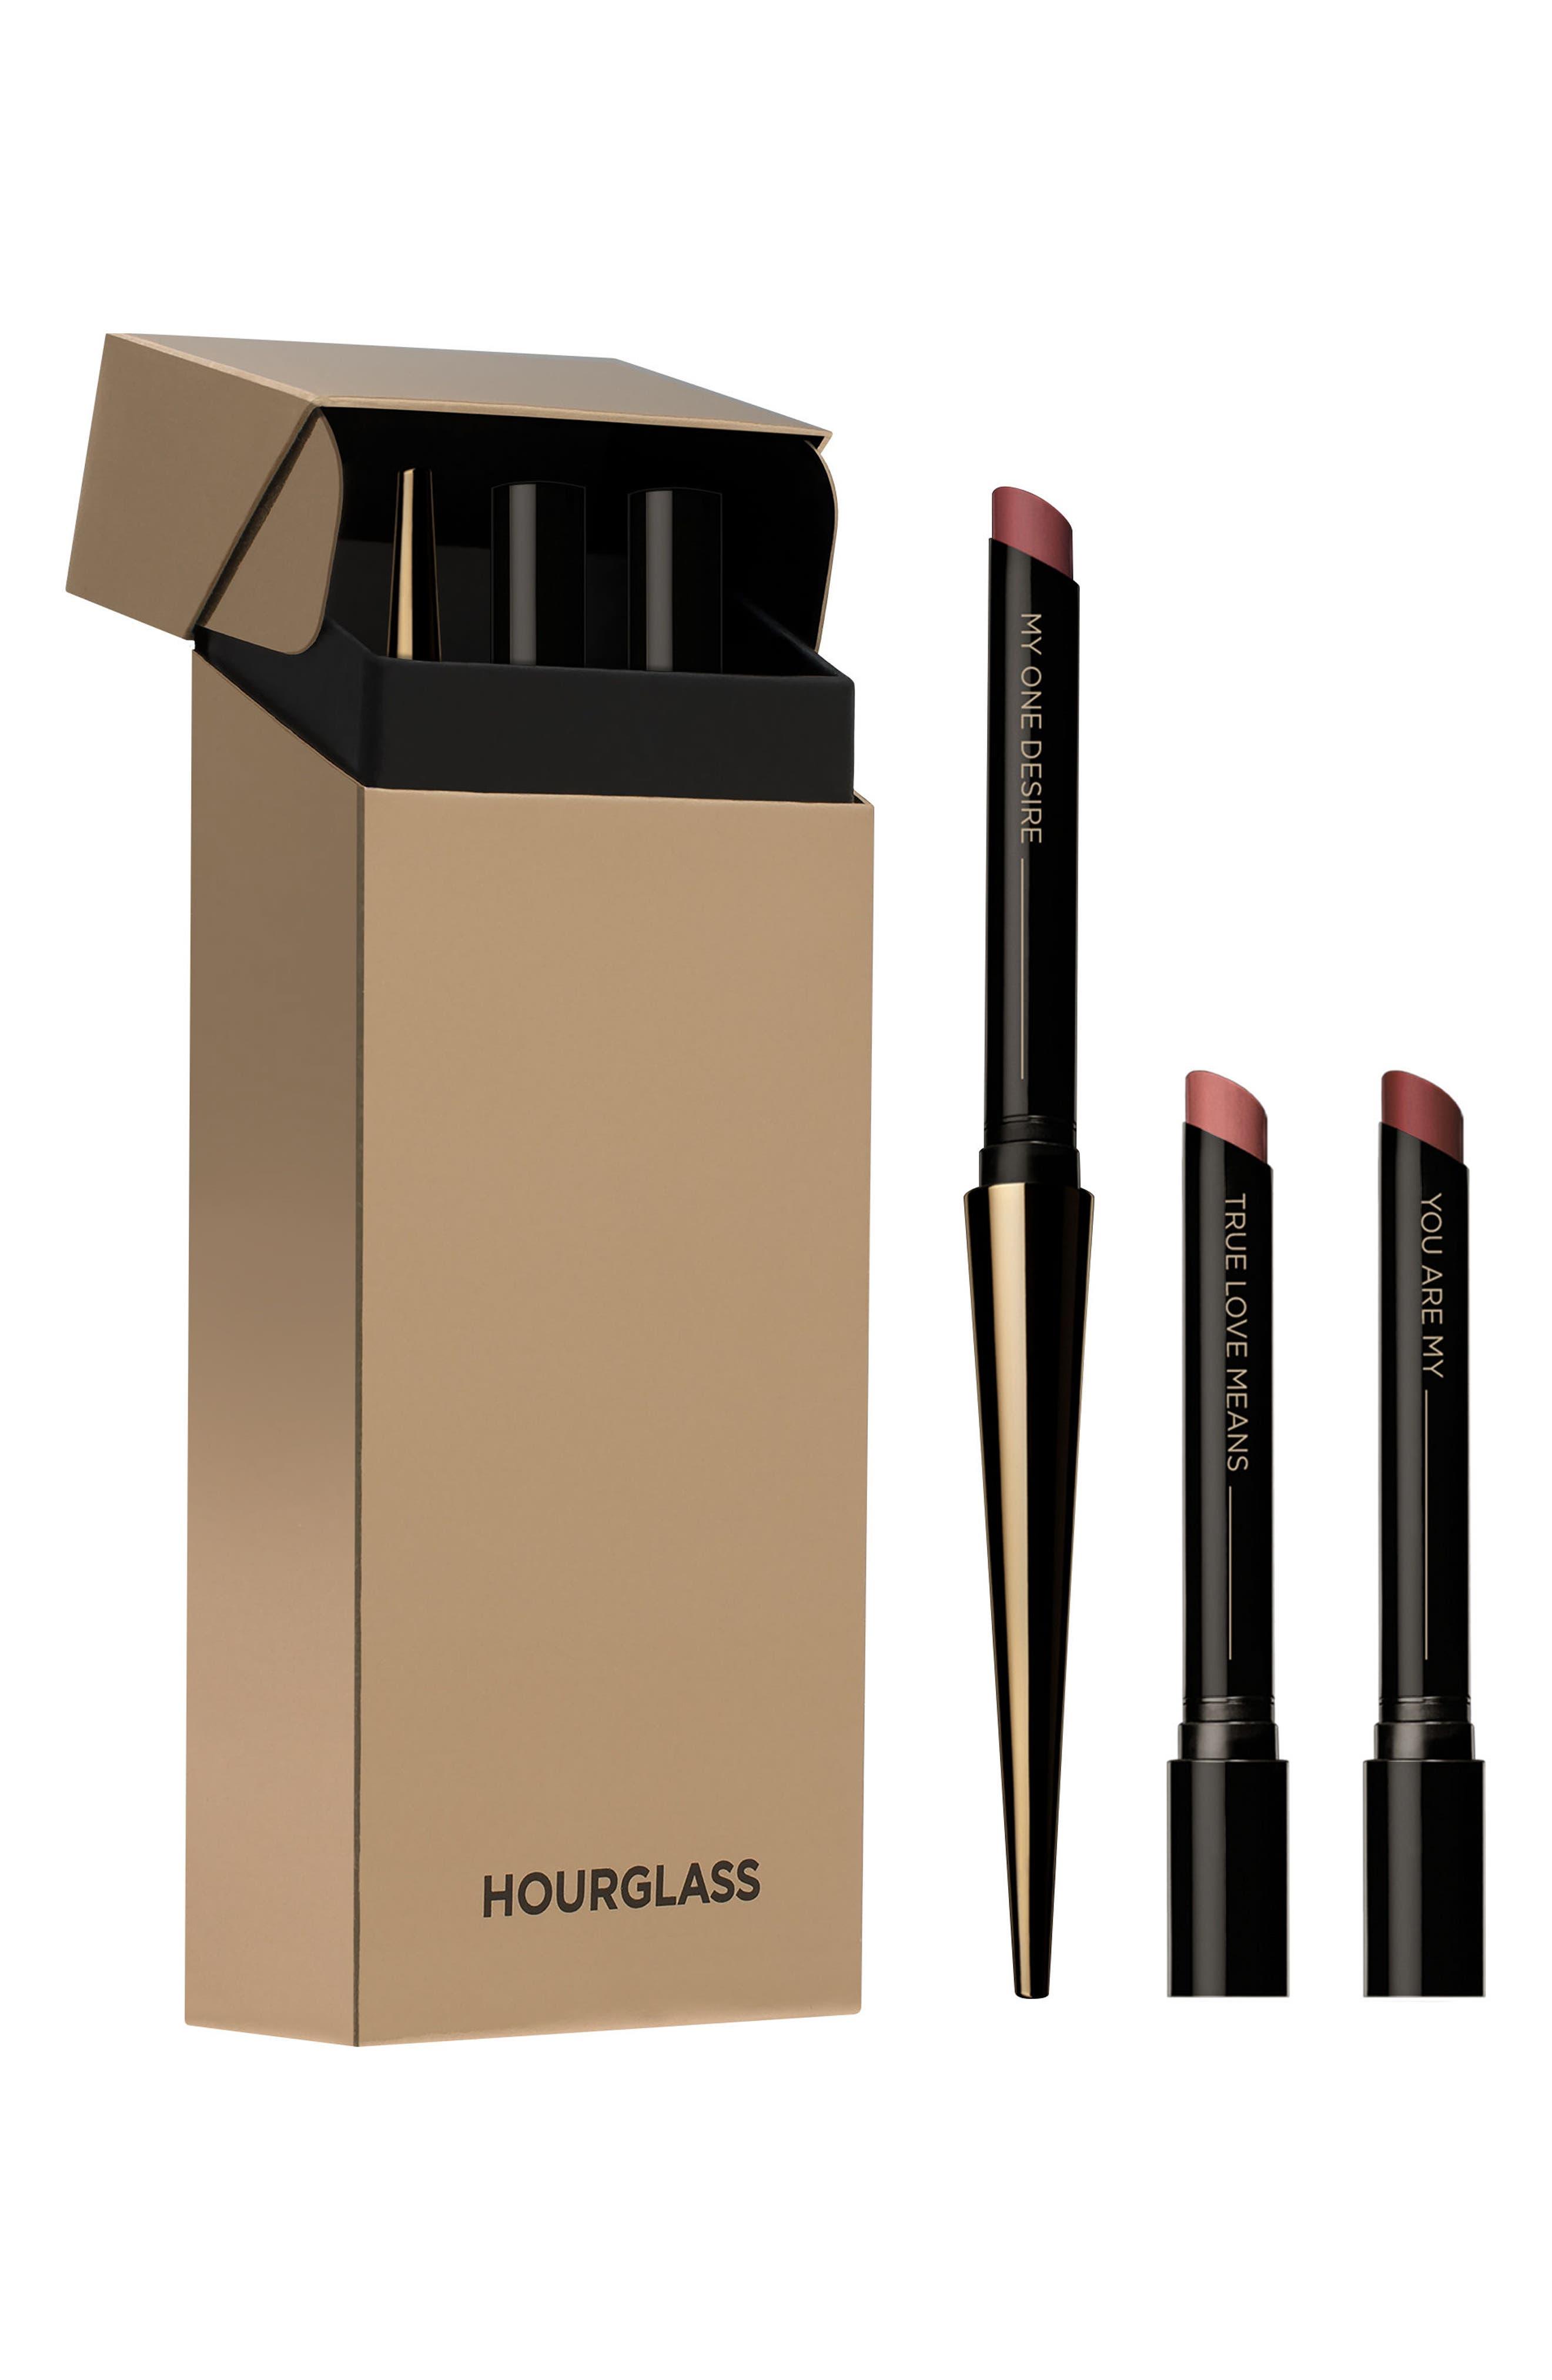 HOURGLASS Confession Refillable Lipstick Set ($78 Value)